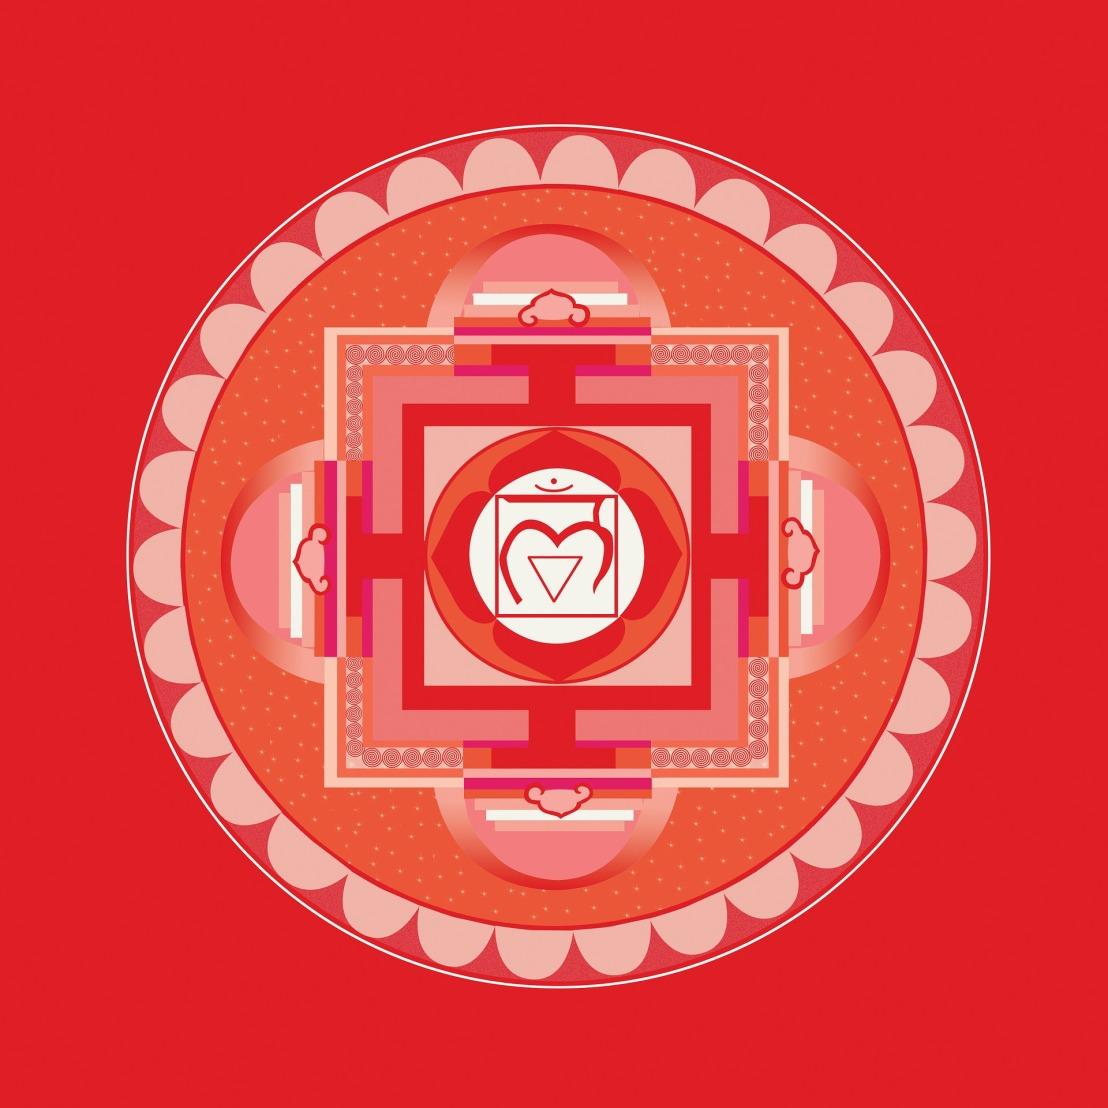 A traditional red mandala